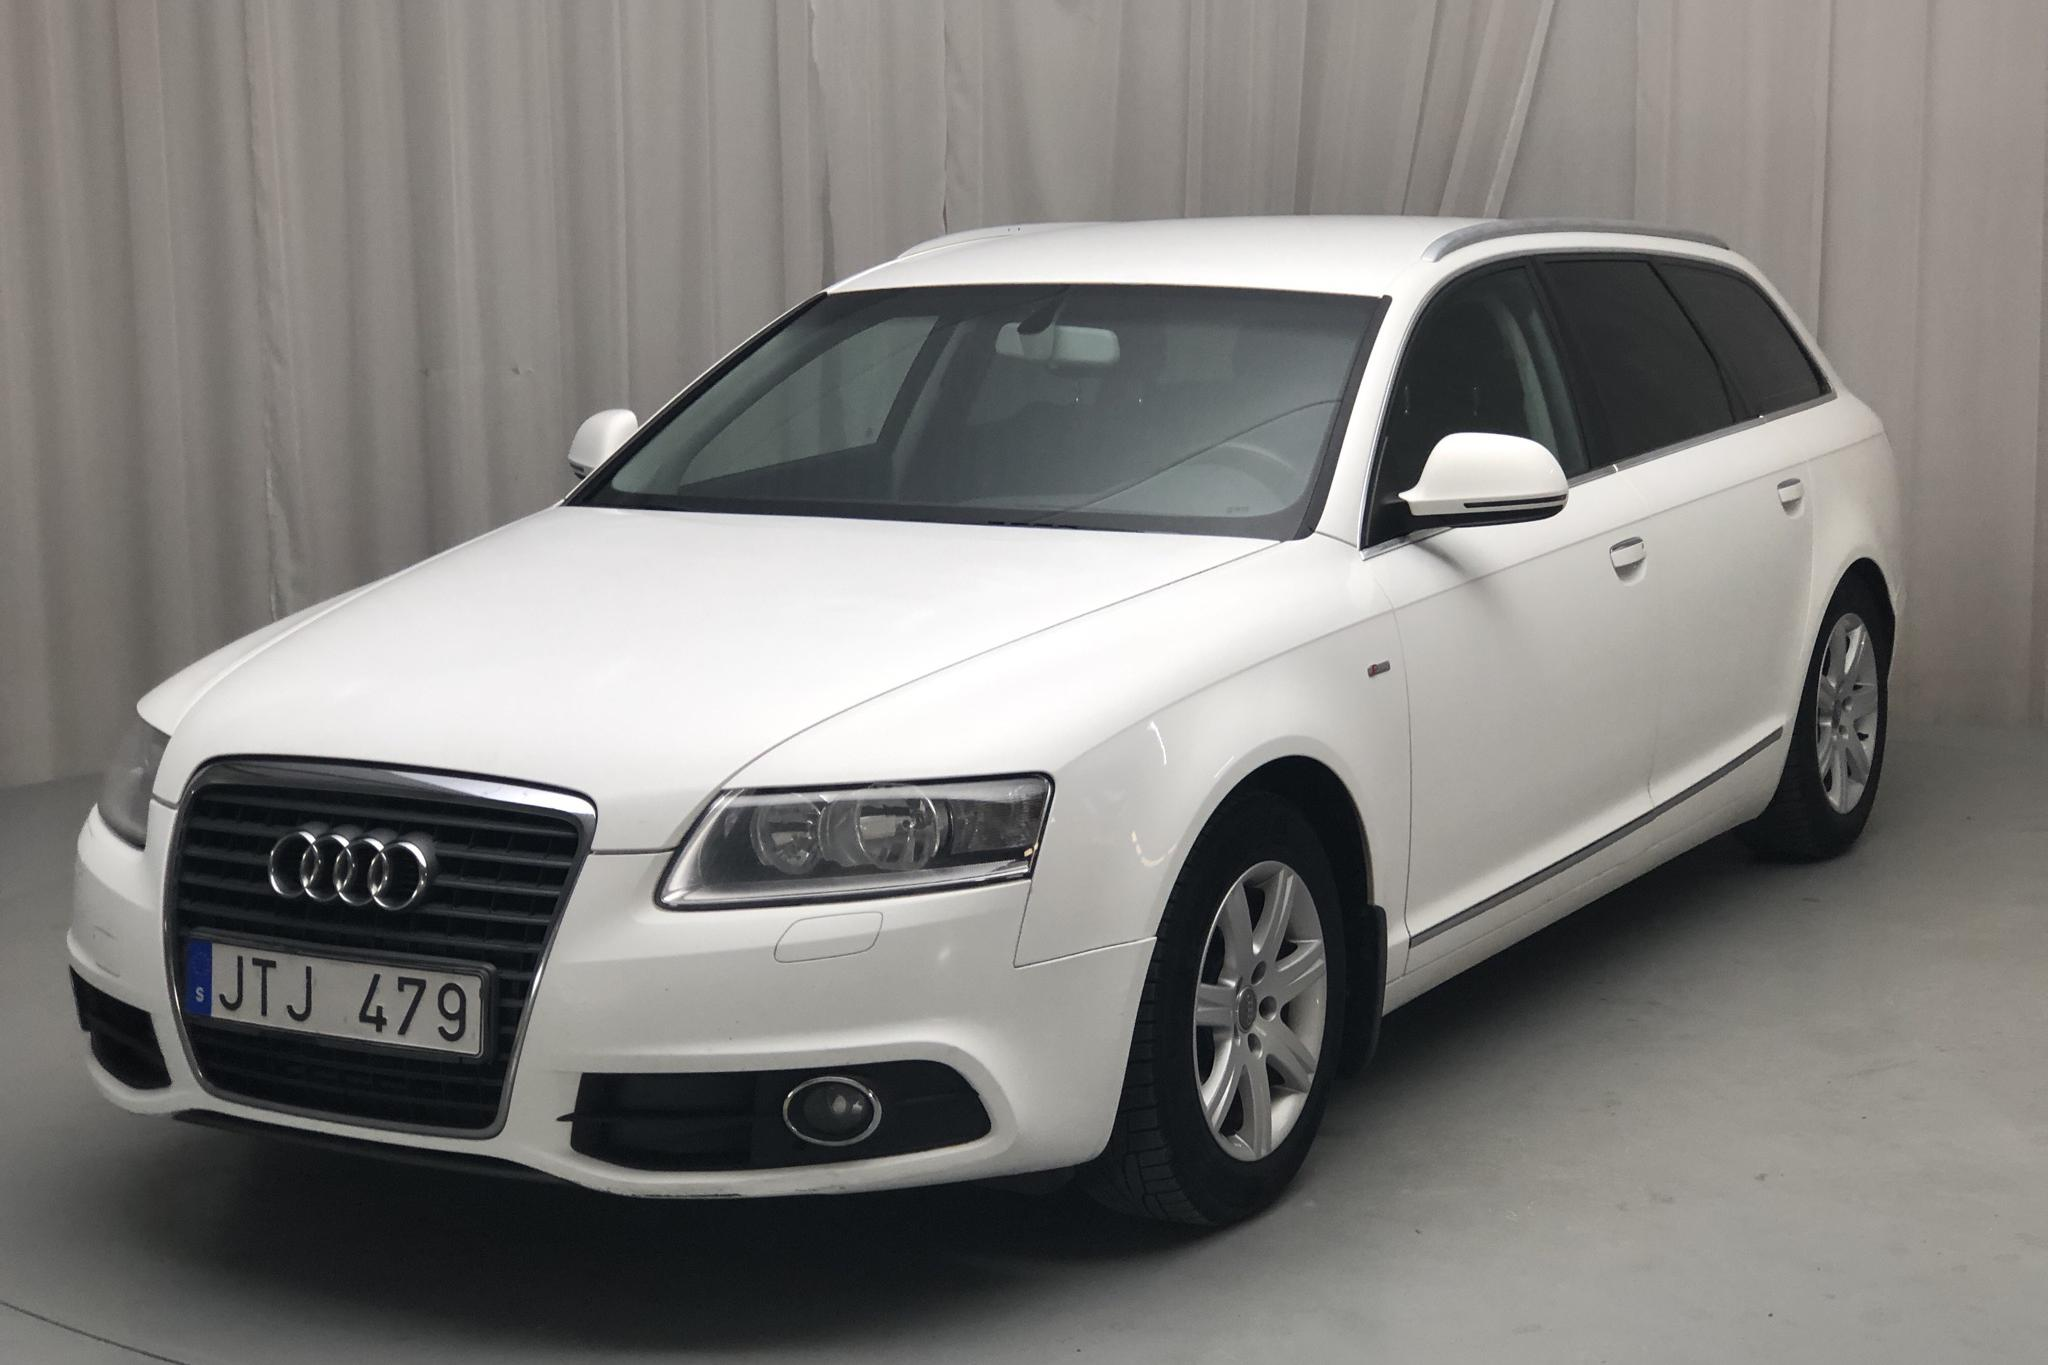 Audi A6 2.0 TDI Avant (170hk) - 275 330 km - Automatic - white - 2009